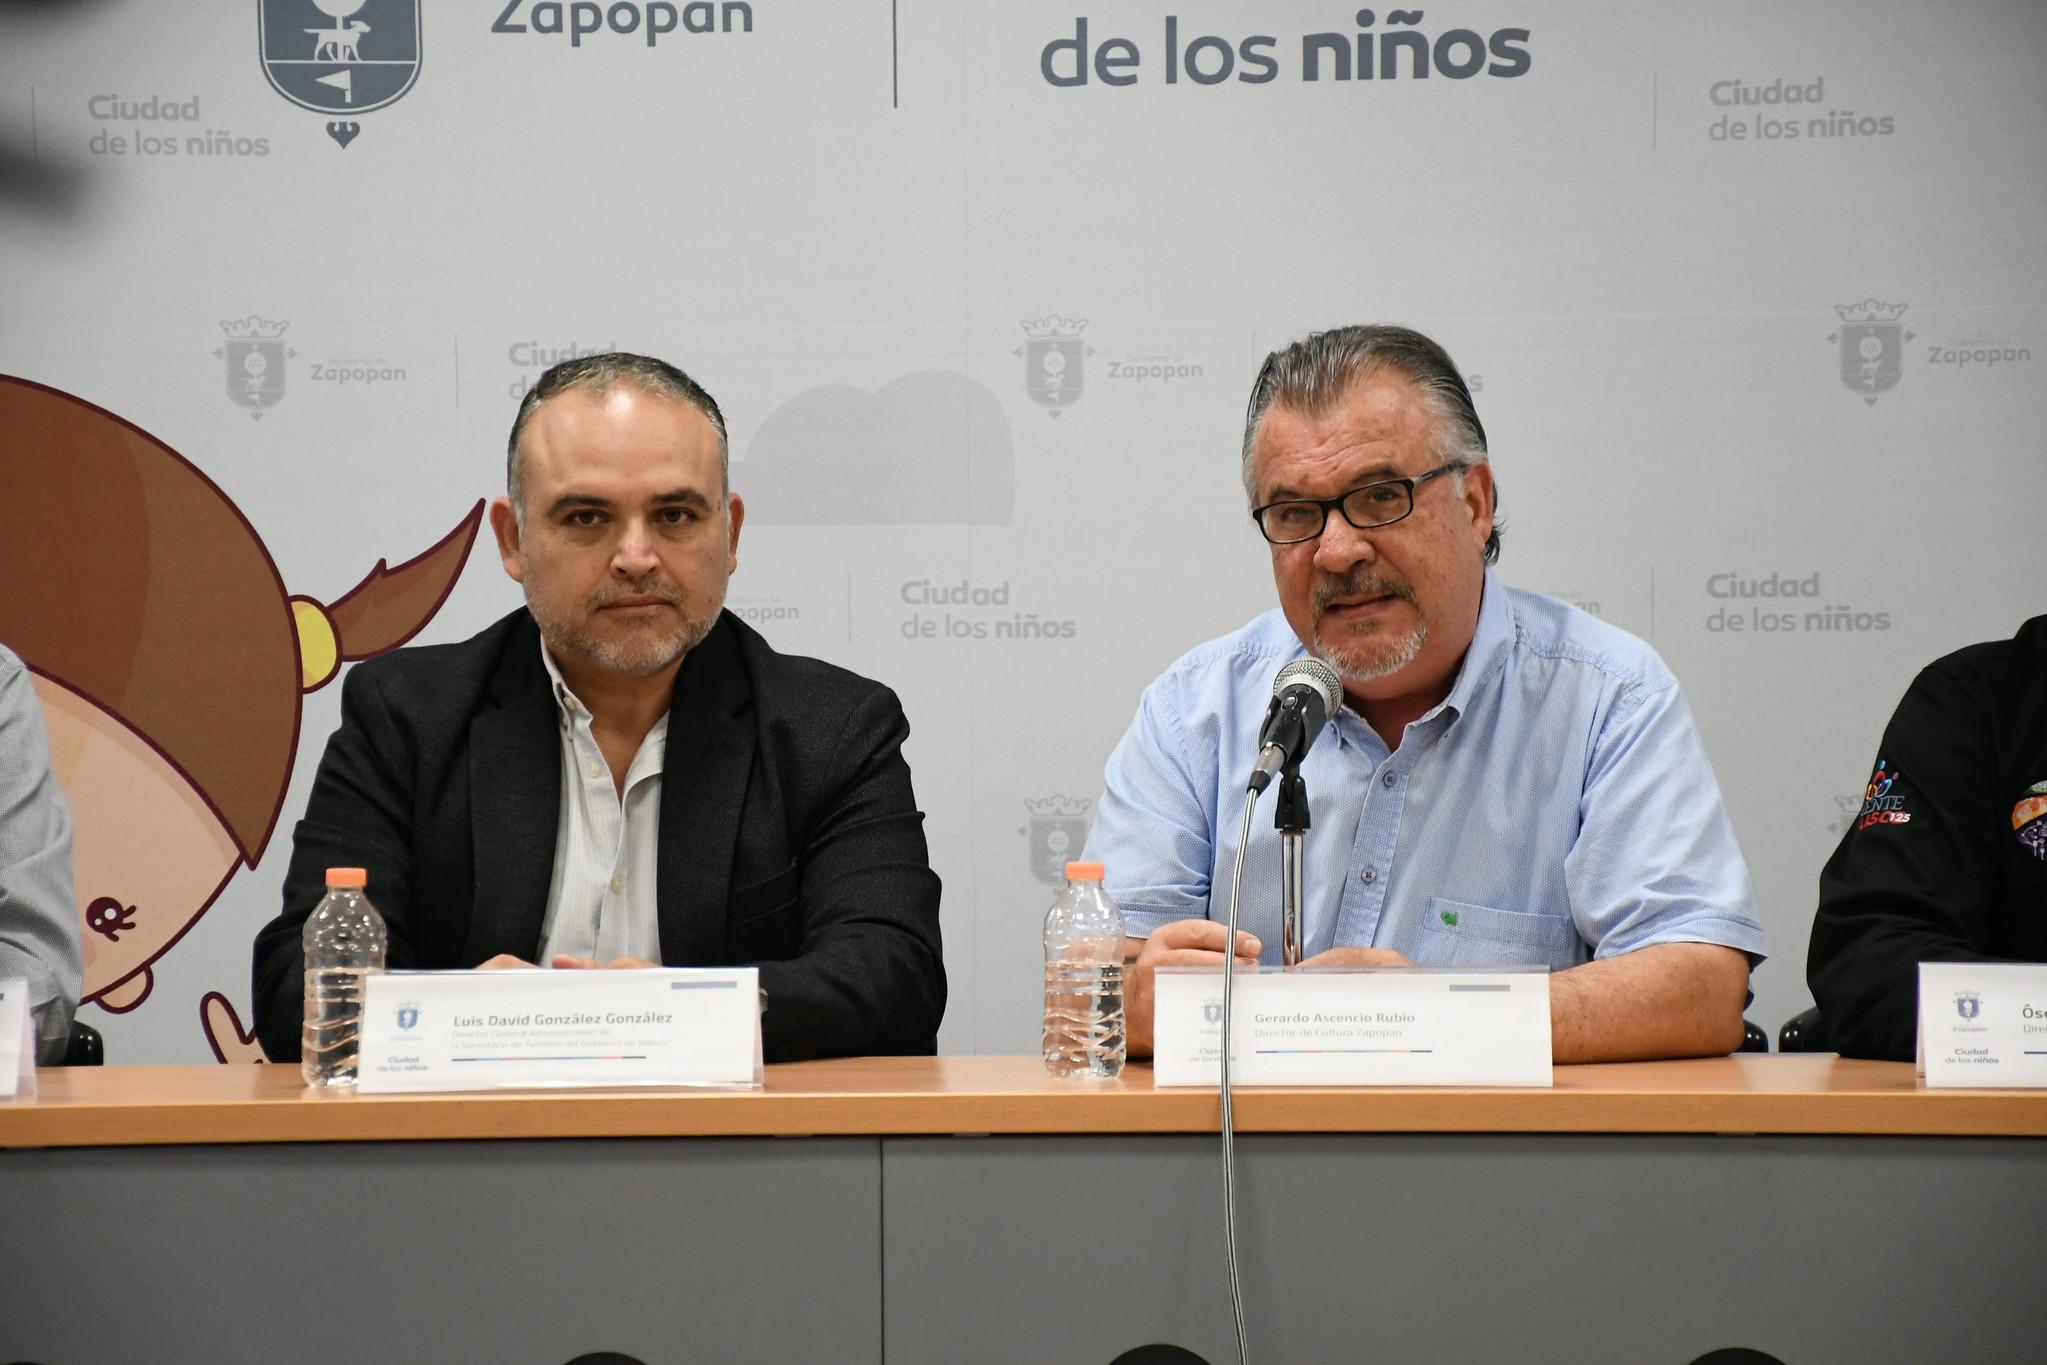 Recibe Zapopan encuentro nacional sobre cocina tradicional mexicana en el Centro Cultural Constitución